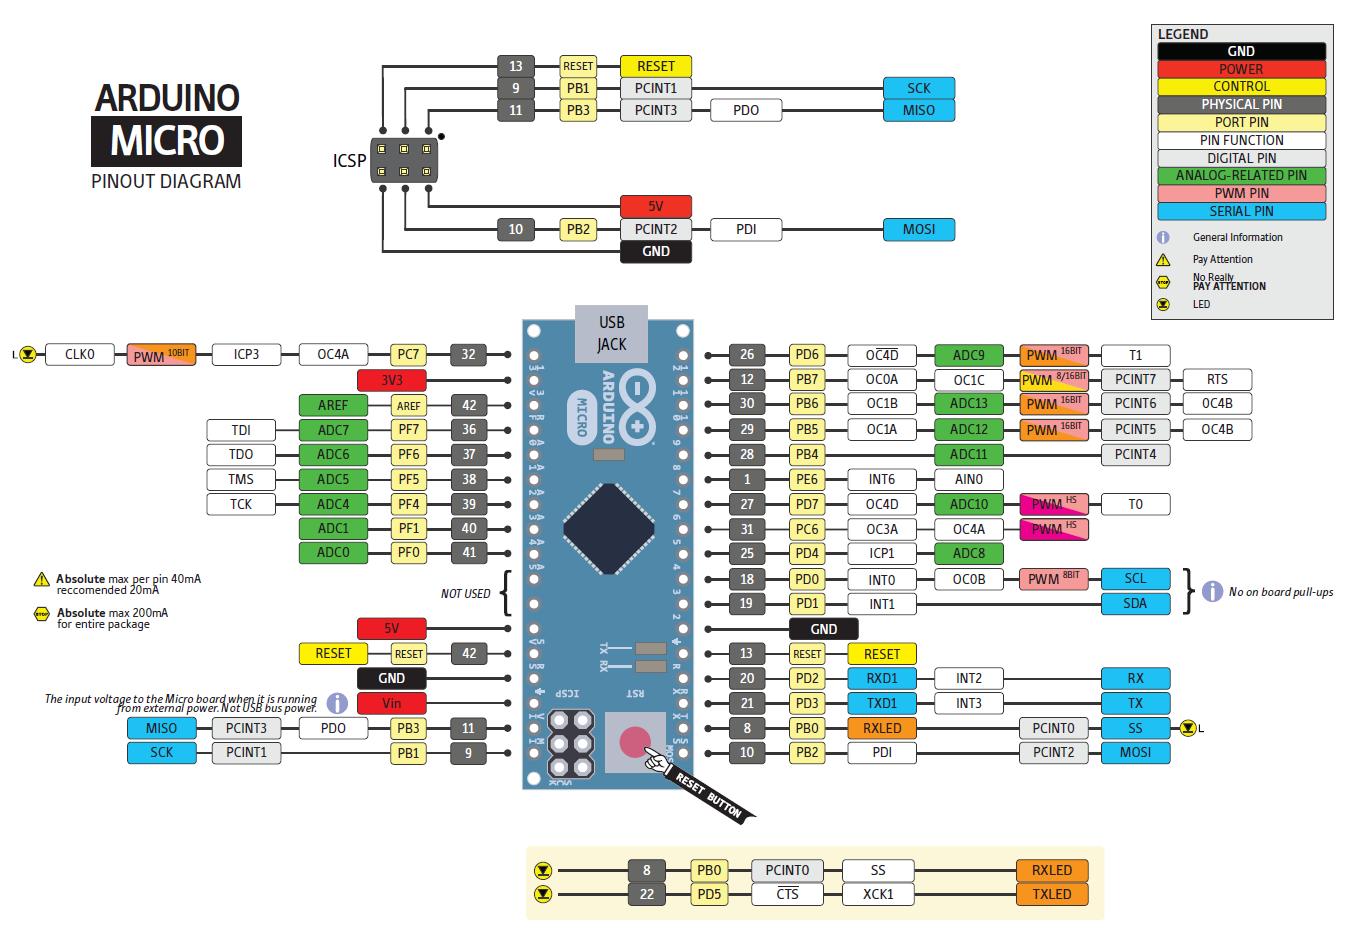 Lcd Diagram Pdf Guide And Troubleshooting Of Wiring Block Tv Micro Pin Diyagram U0131 U00ab Veli Utas Bir Elektronik U00e7inin Ki U015fisel Blo U011fu Monitor Circuit